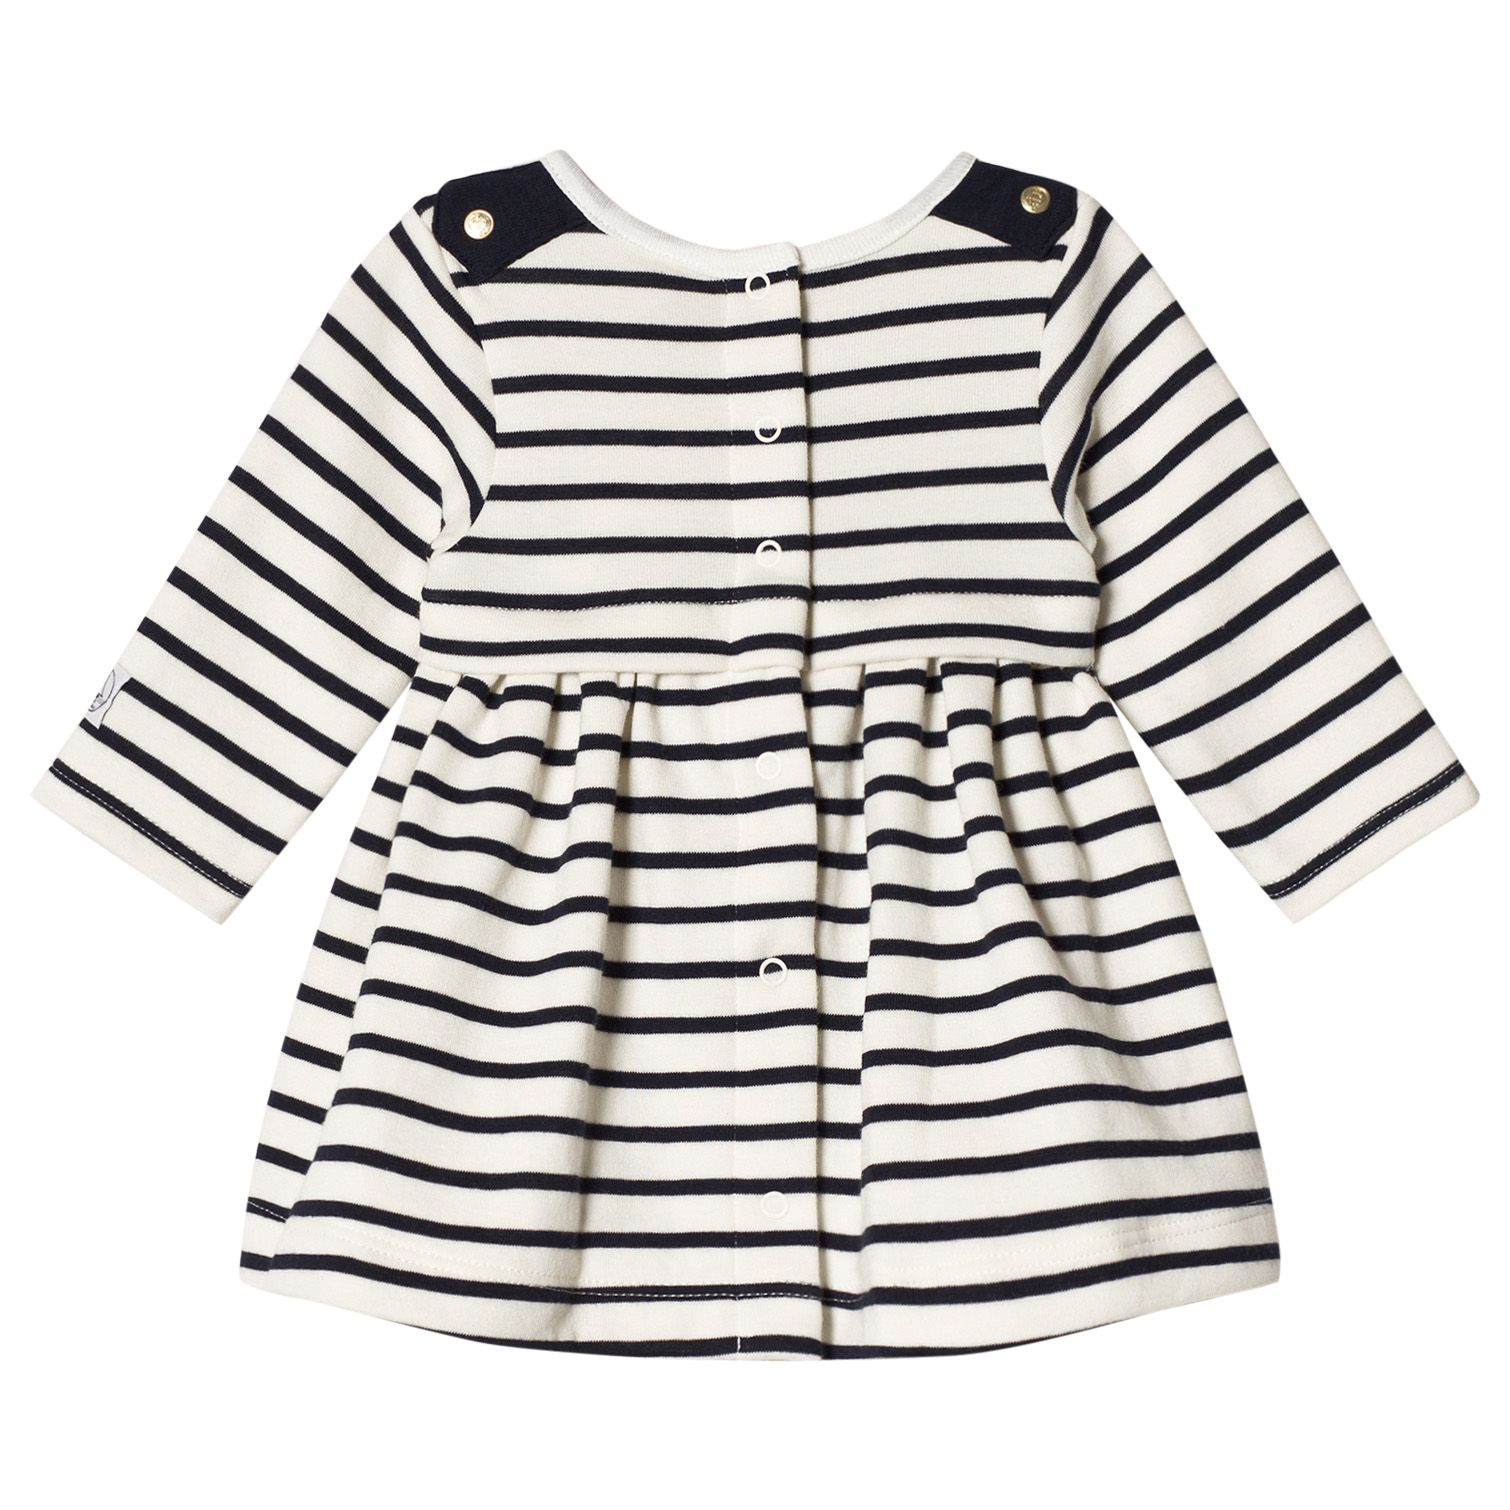 Navy and White Stripe Baby Dress